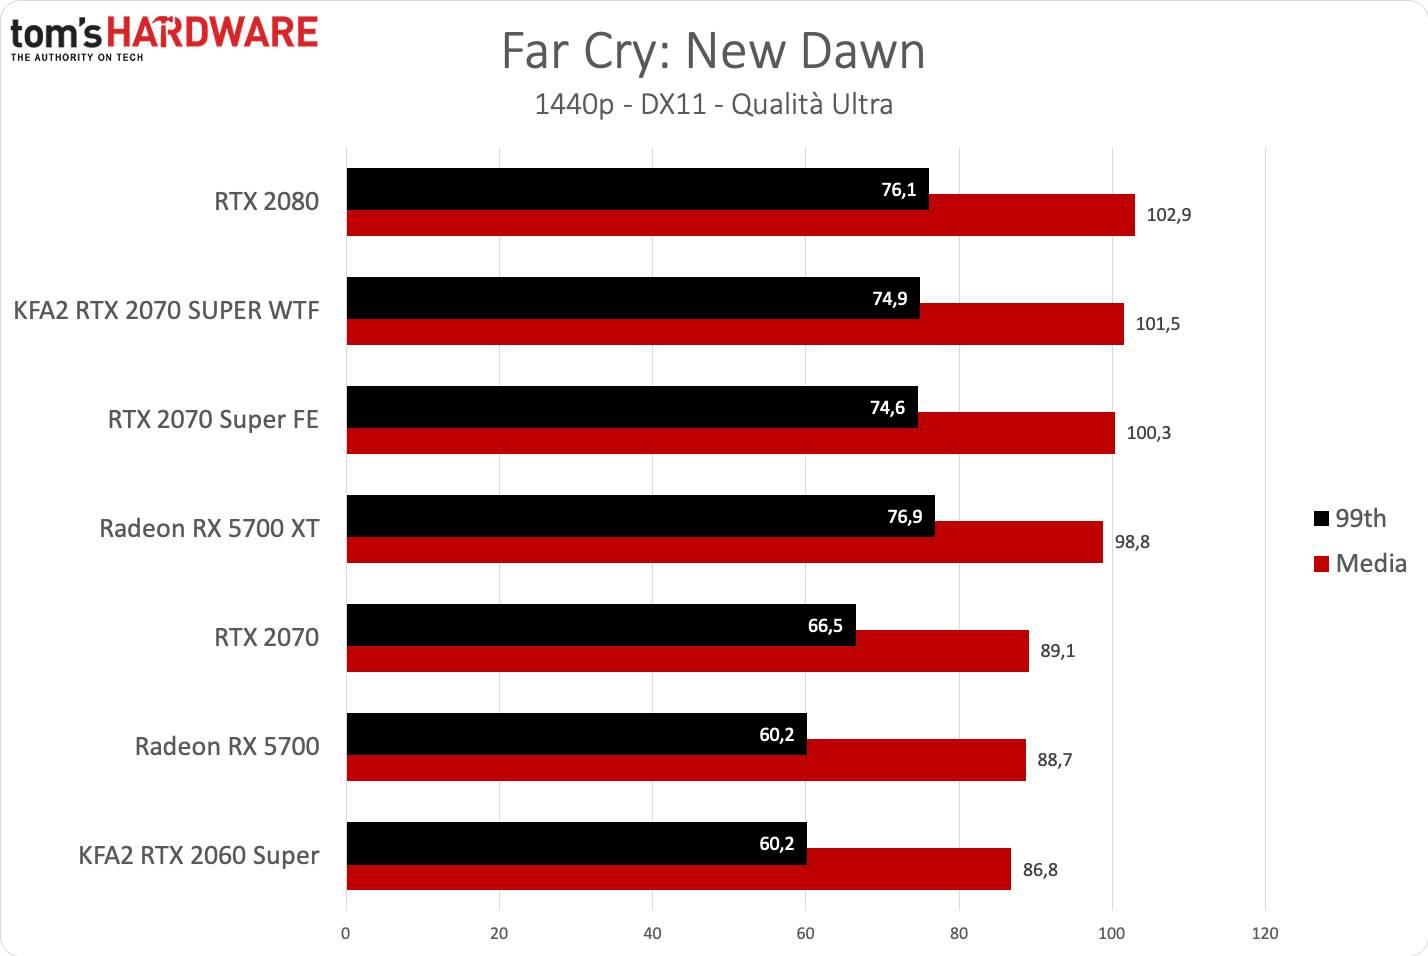 KFA2 RTX 2070 SUPER WTF - Far Cry QHD